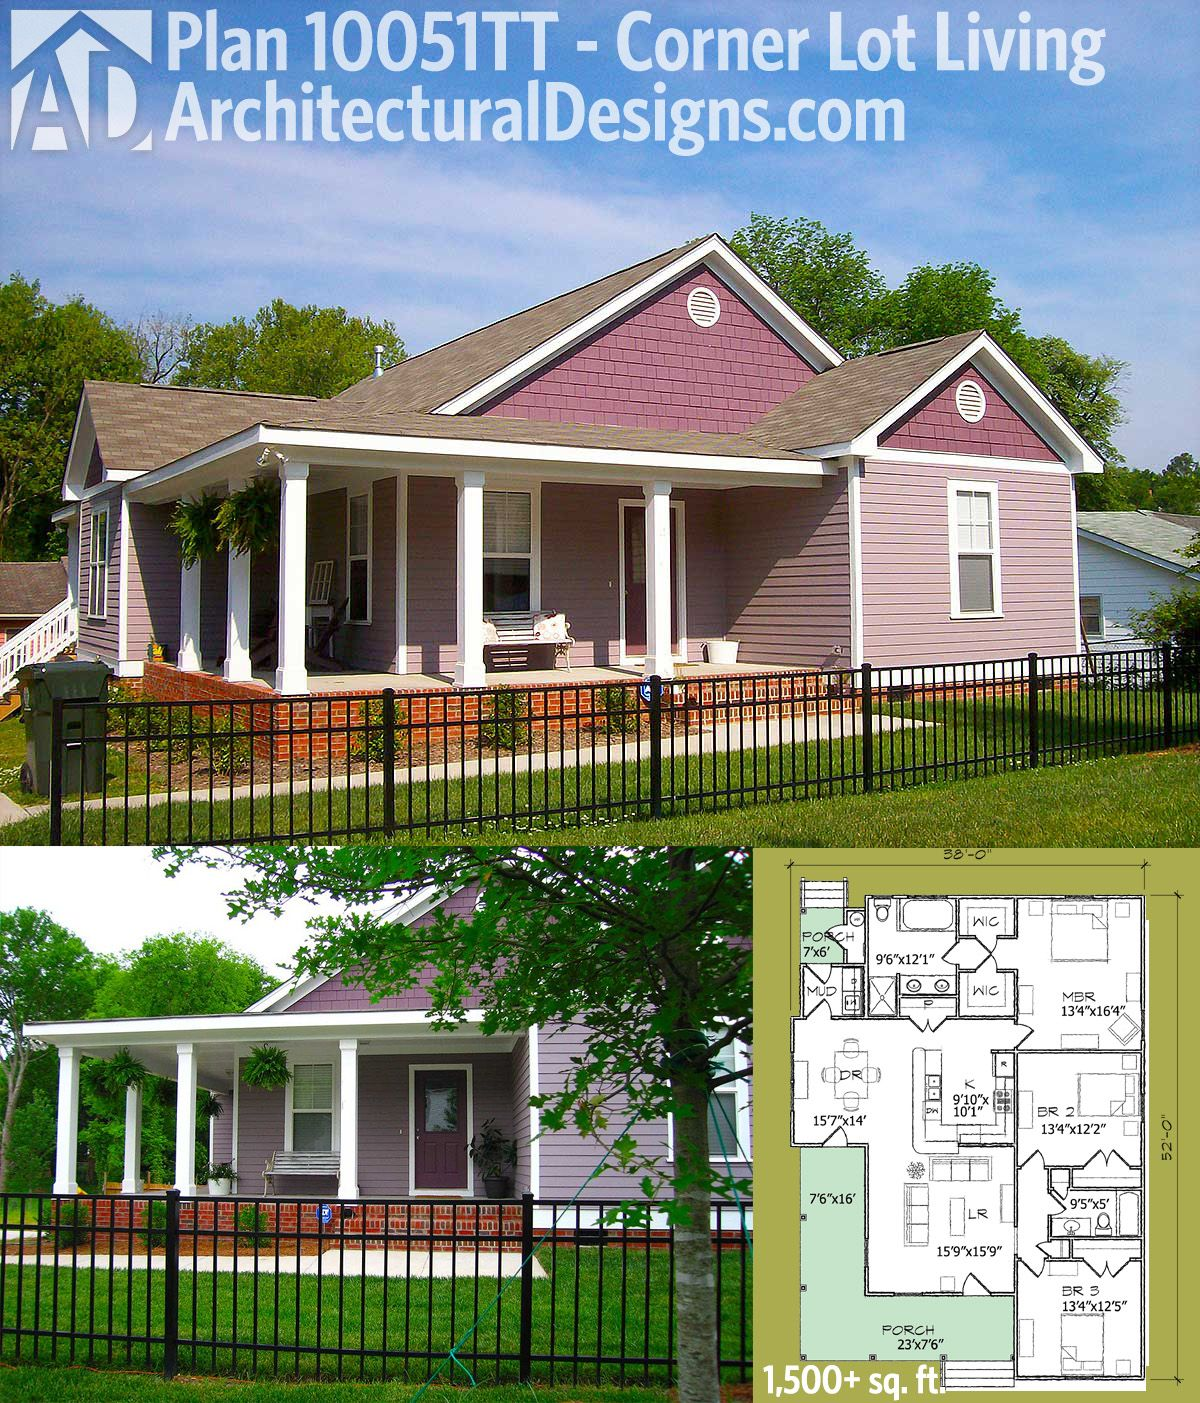 Plan 10051tt Corner Lot Living Architectural Design House Plans House Plans House Design